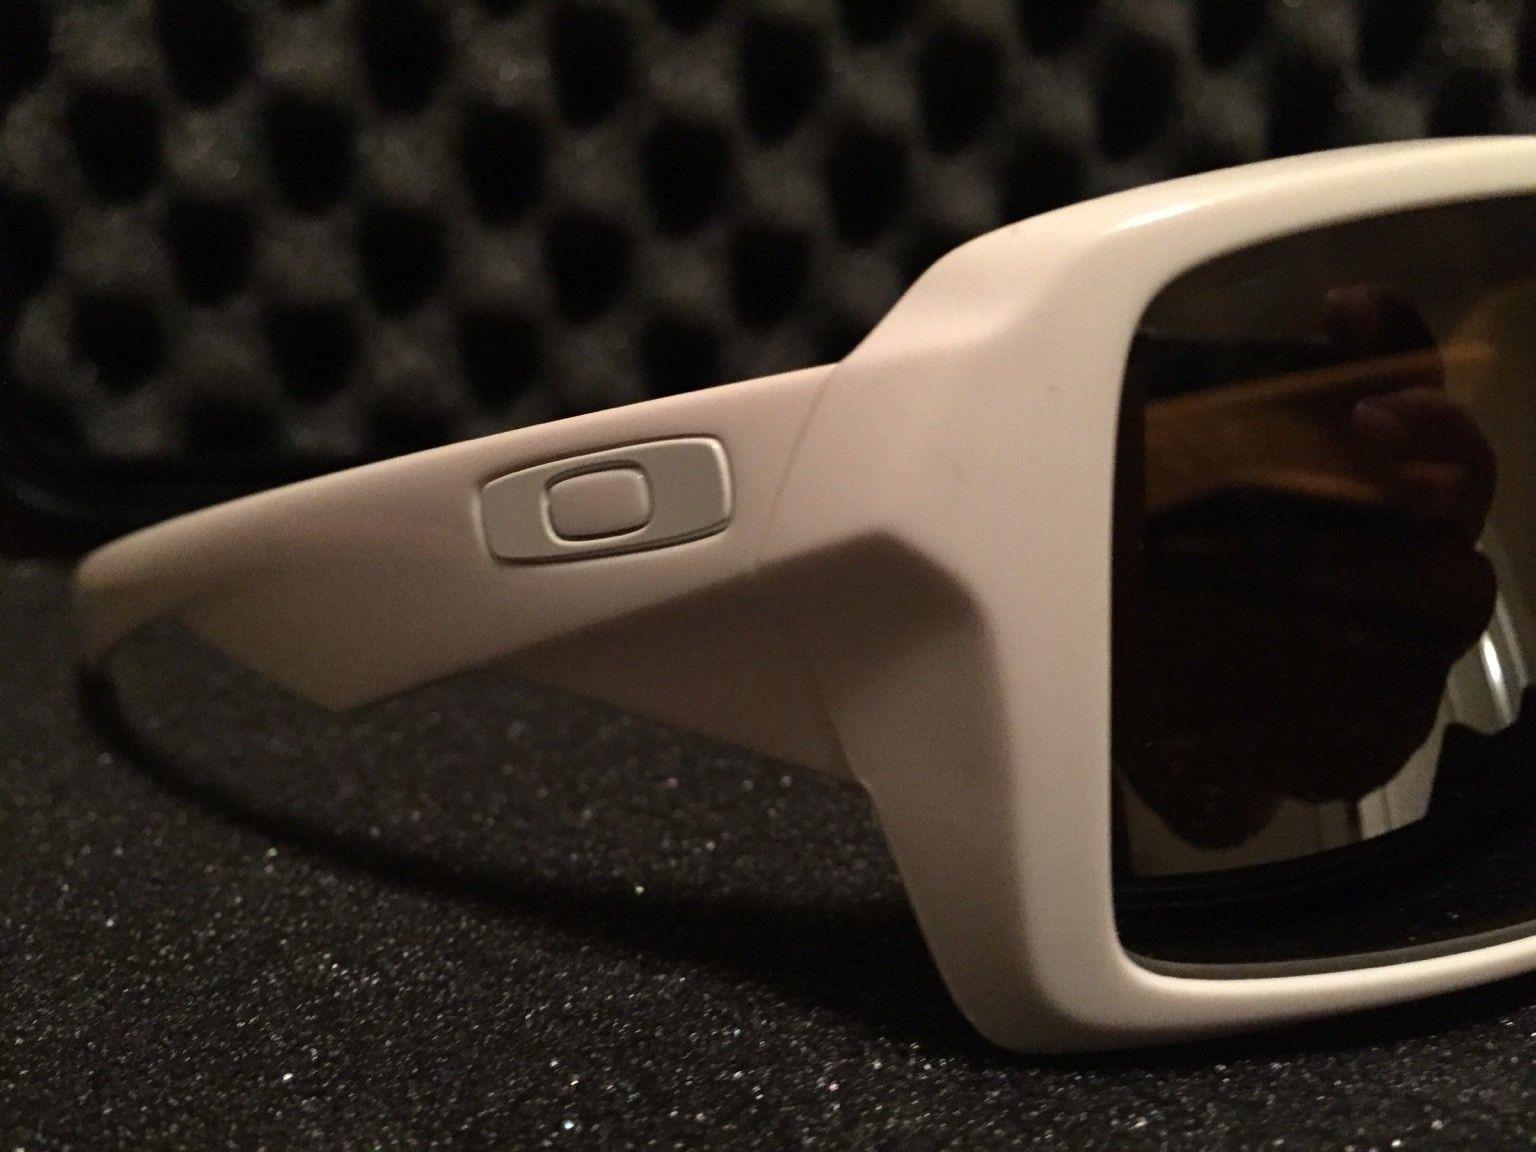 White Eyepatch 1's. Includes unused Titanium Lenses - ImageUploadedByTapatalk1455335852.999781.jpg